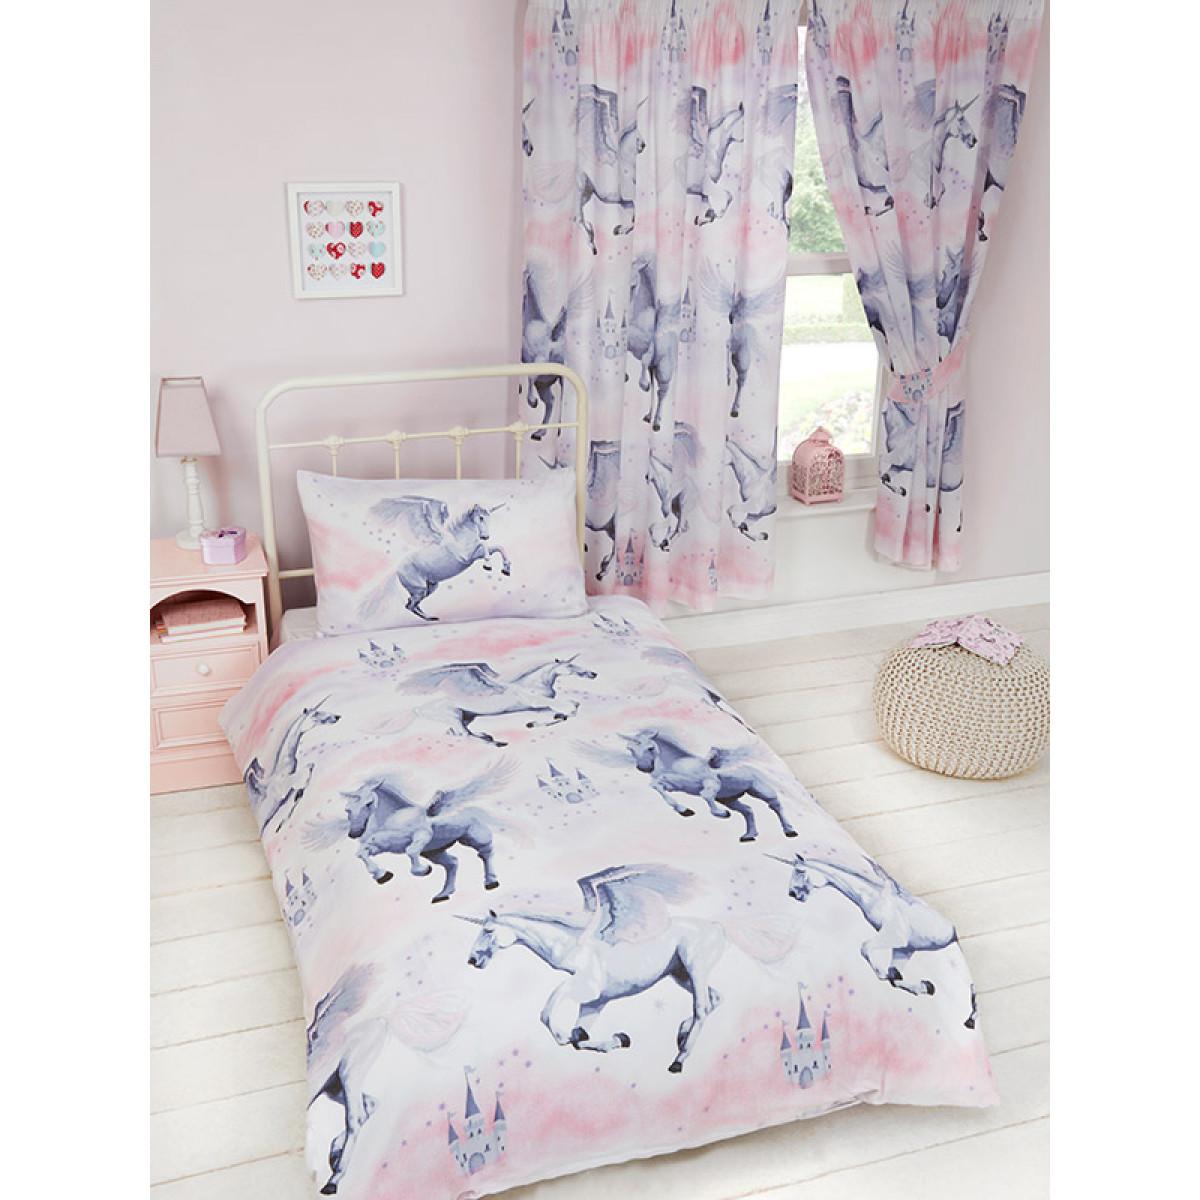 Pink Stardust Unicorn Single Duvet Cover  Pillowcase